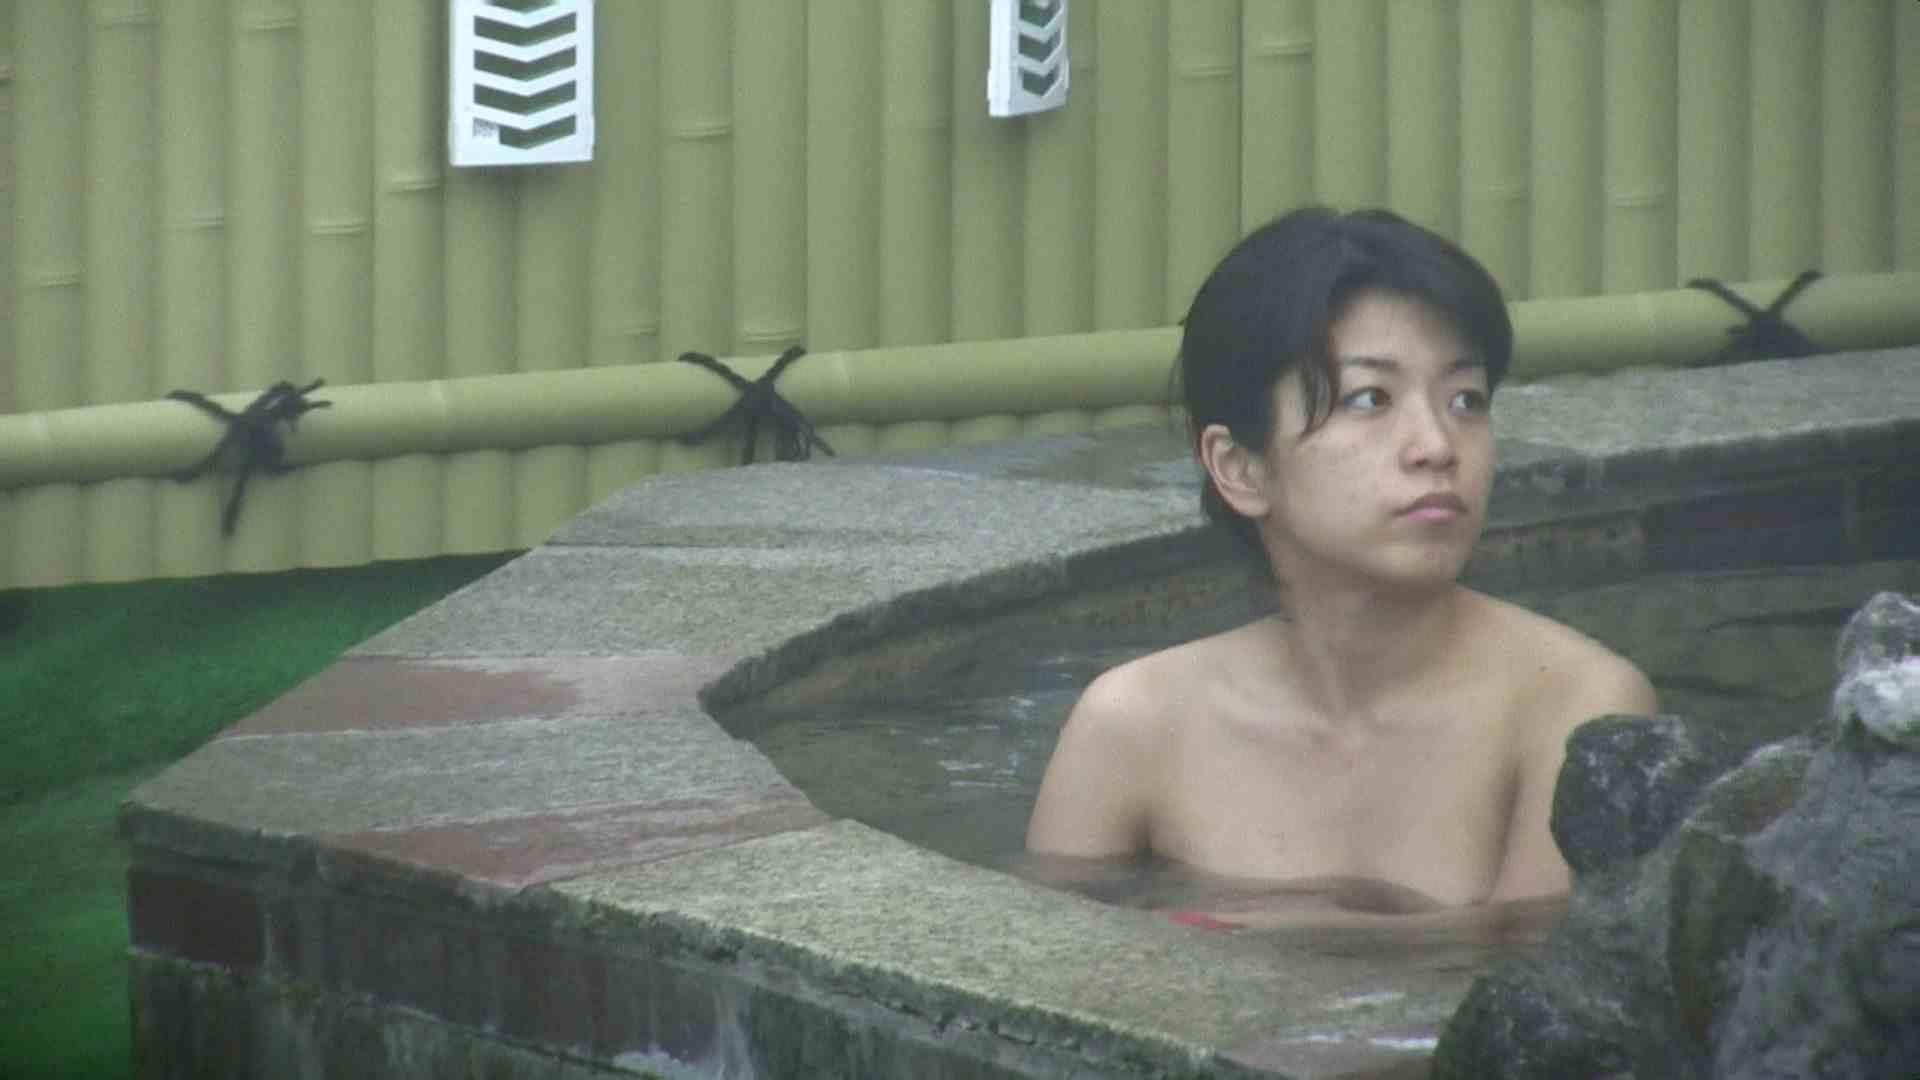 Aquaな露天風呂Vol.585 HなOL | 盗撮  93pic 24